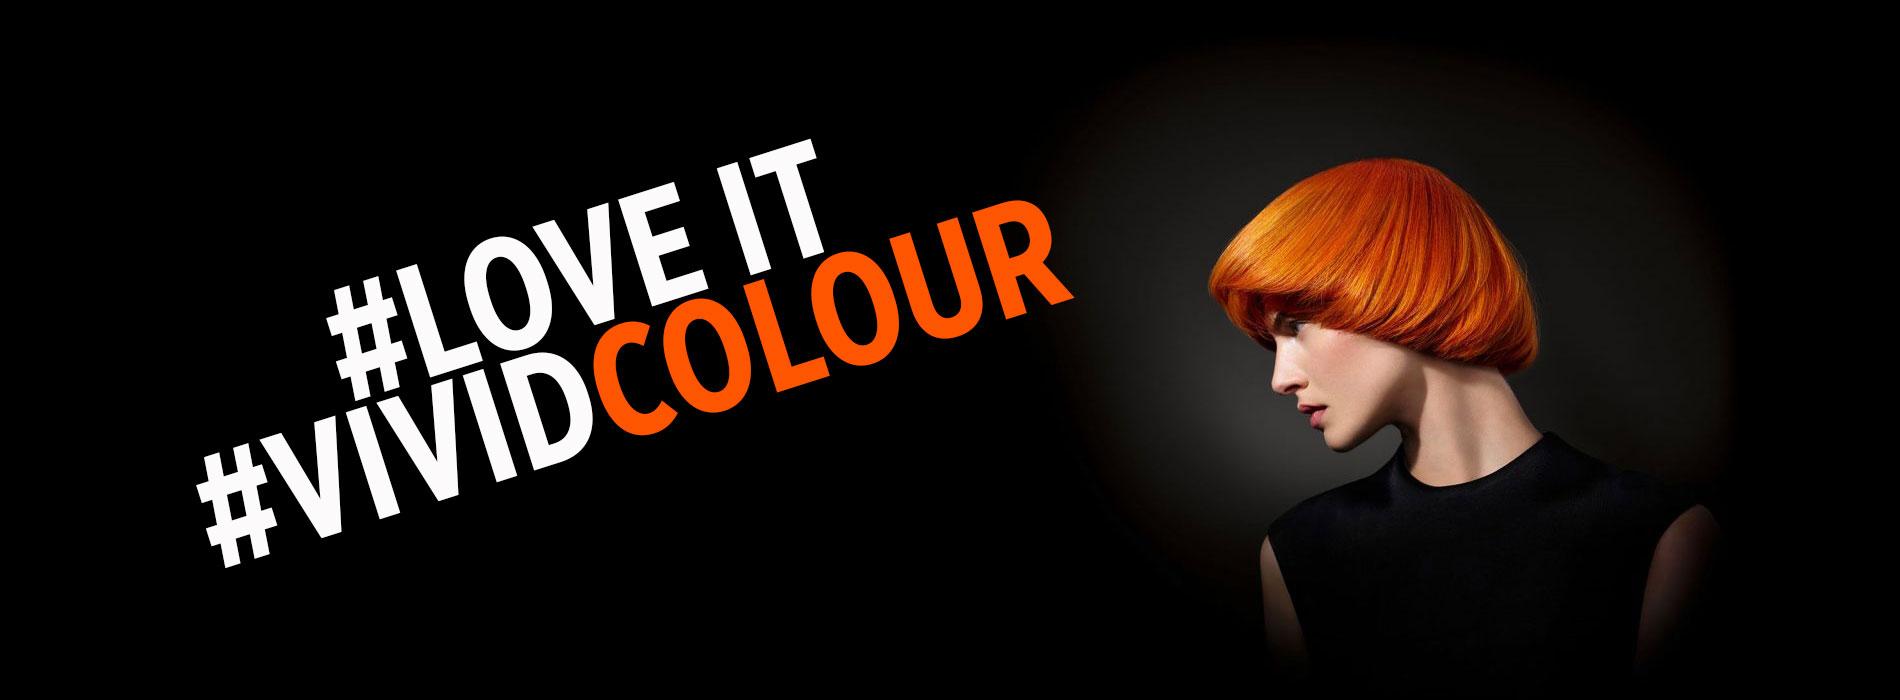 hair cuts, colours. salons in milton keynes, towcester